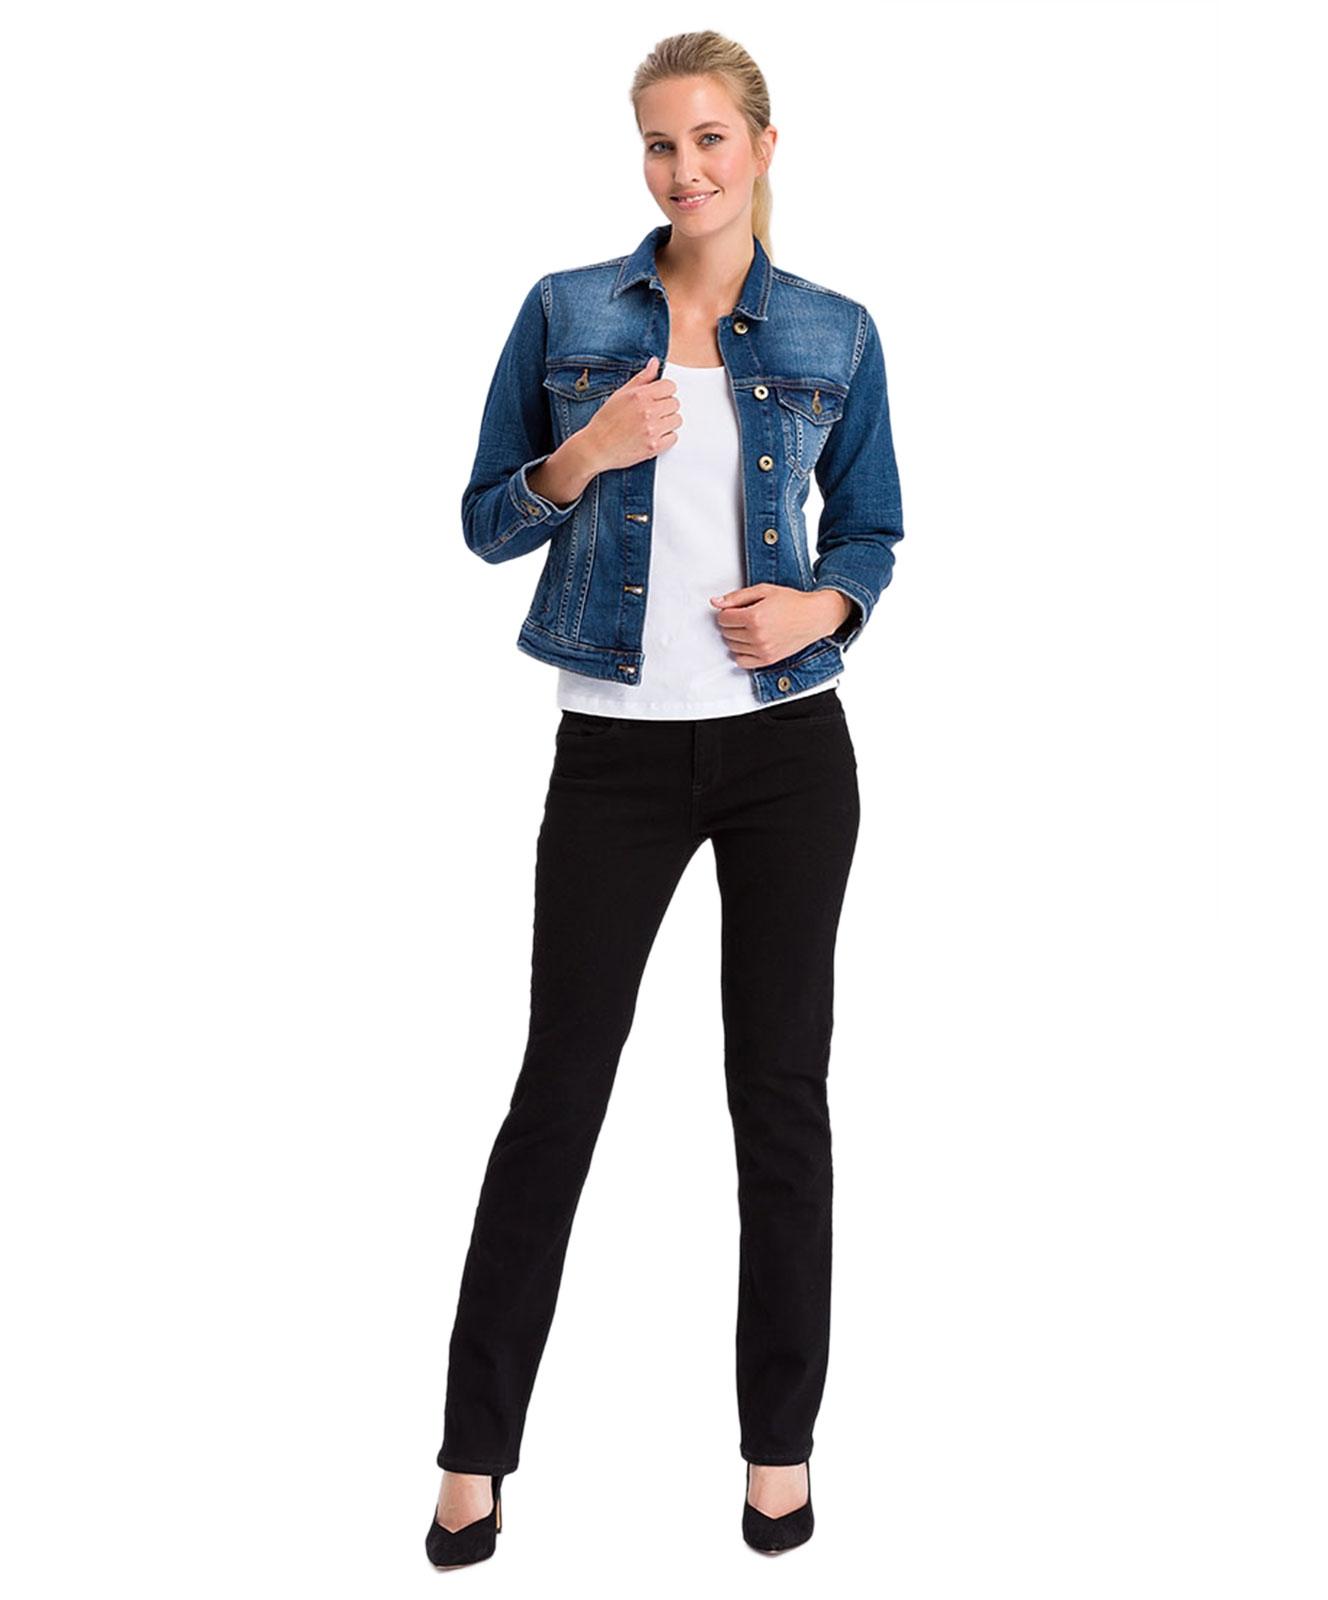 Hosen - Cross Straight Leg Jeans Rose in Black  - Onlineshop Jeans Meile